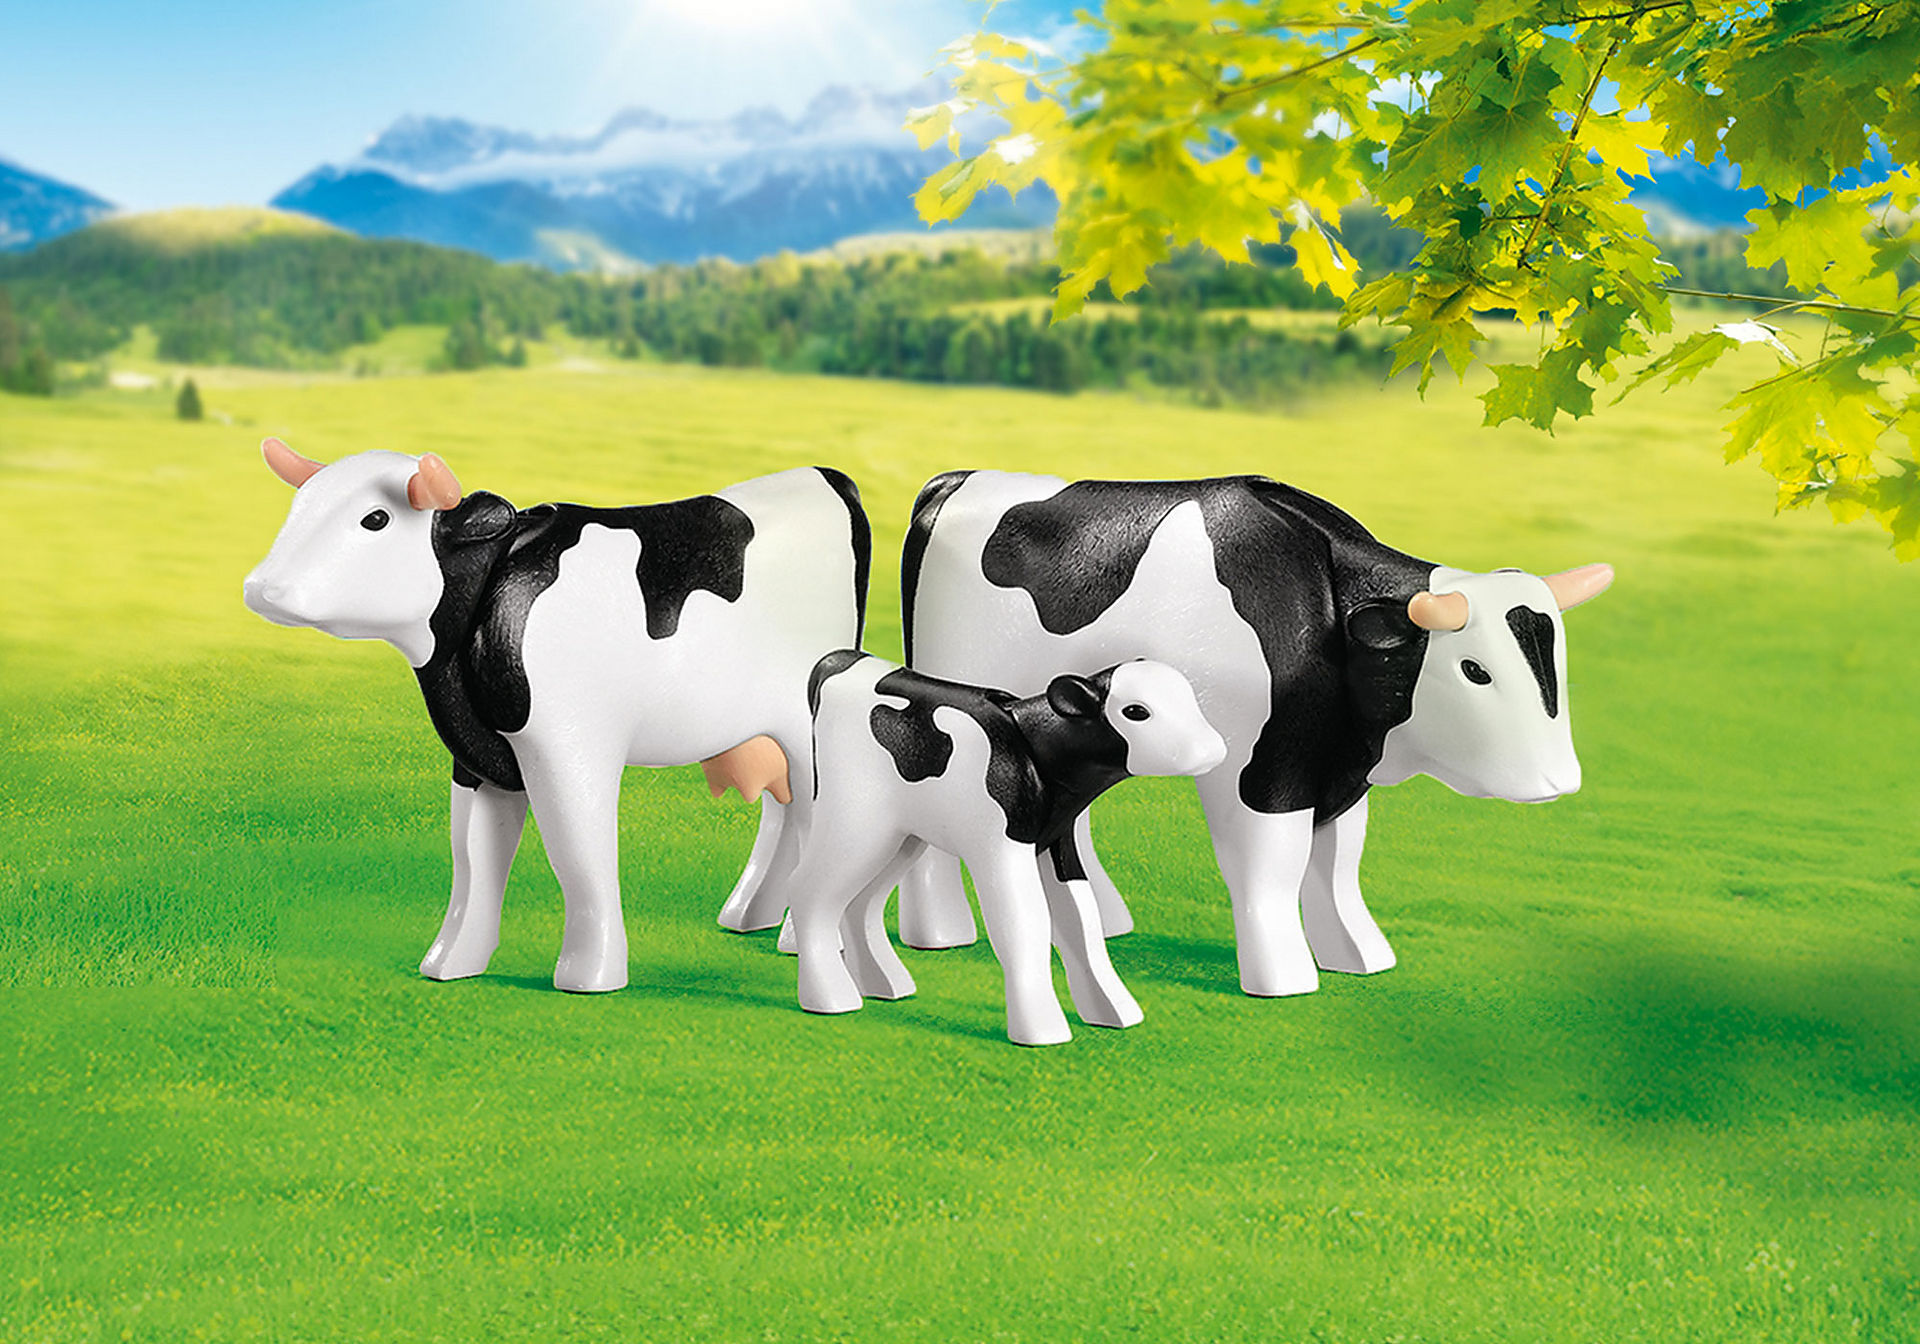 http://media.playmobil.com/i/playmobil/7892_product_detail/2 vaches avec veau noirs / blancs